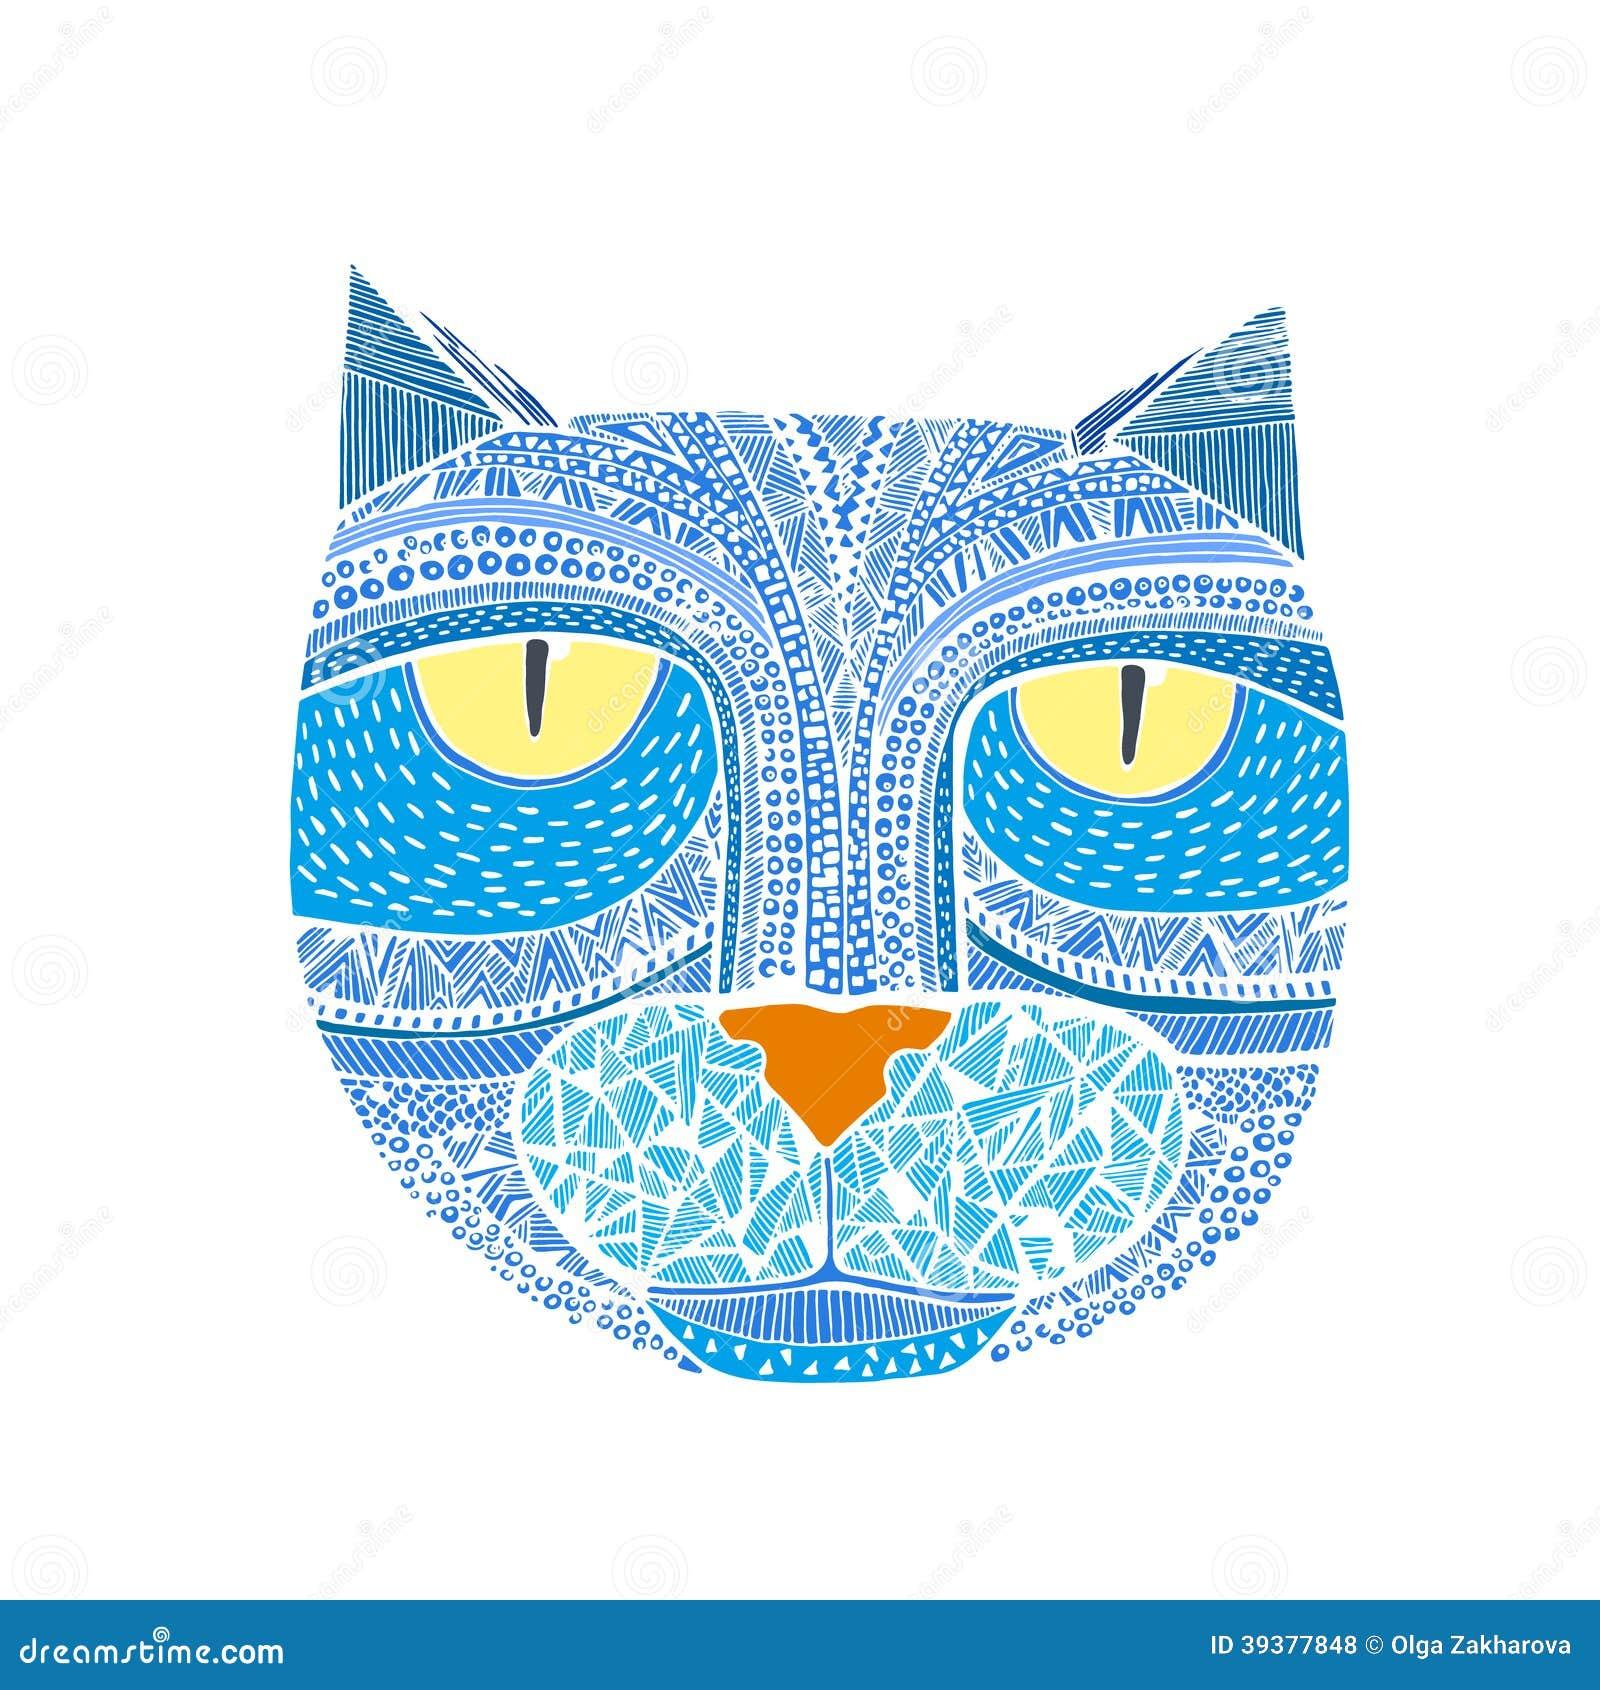 Concorso Design Your Cat : Hand drawn graphic vector of a cat unique art